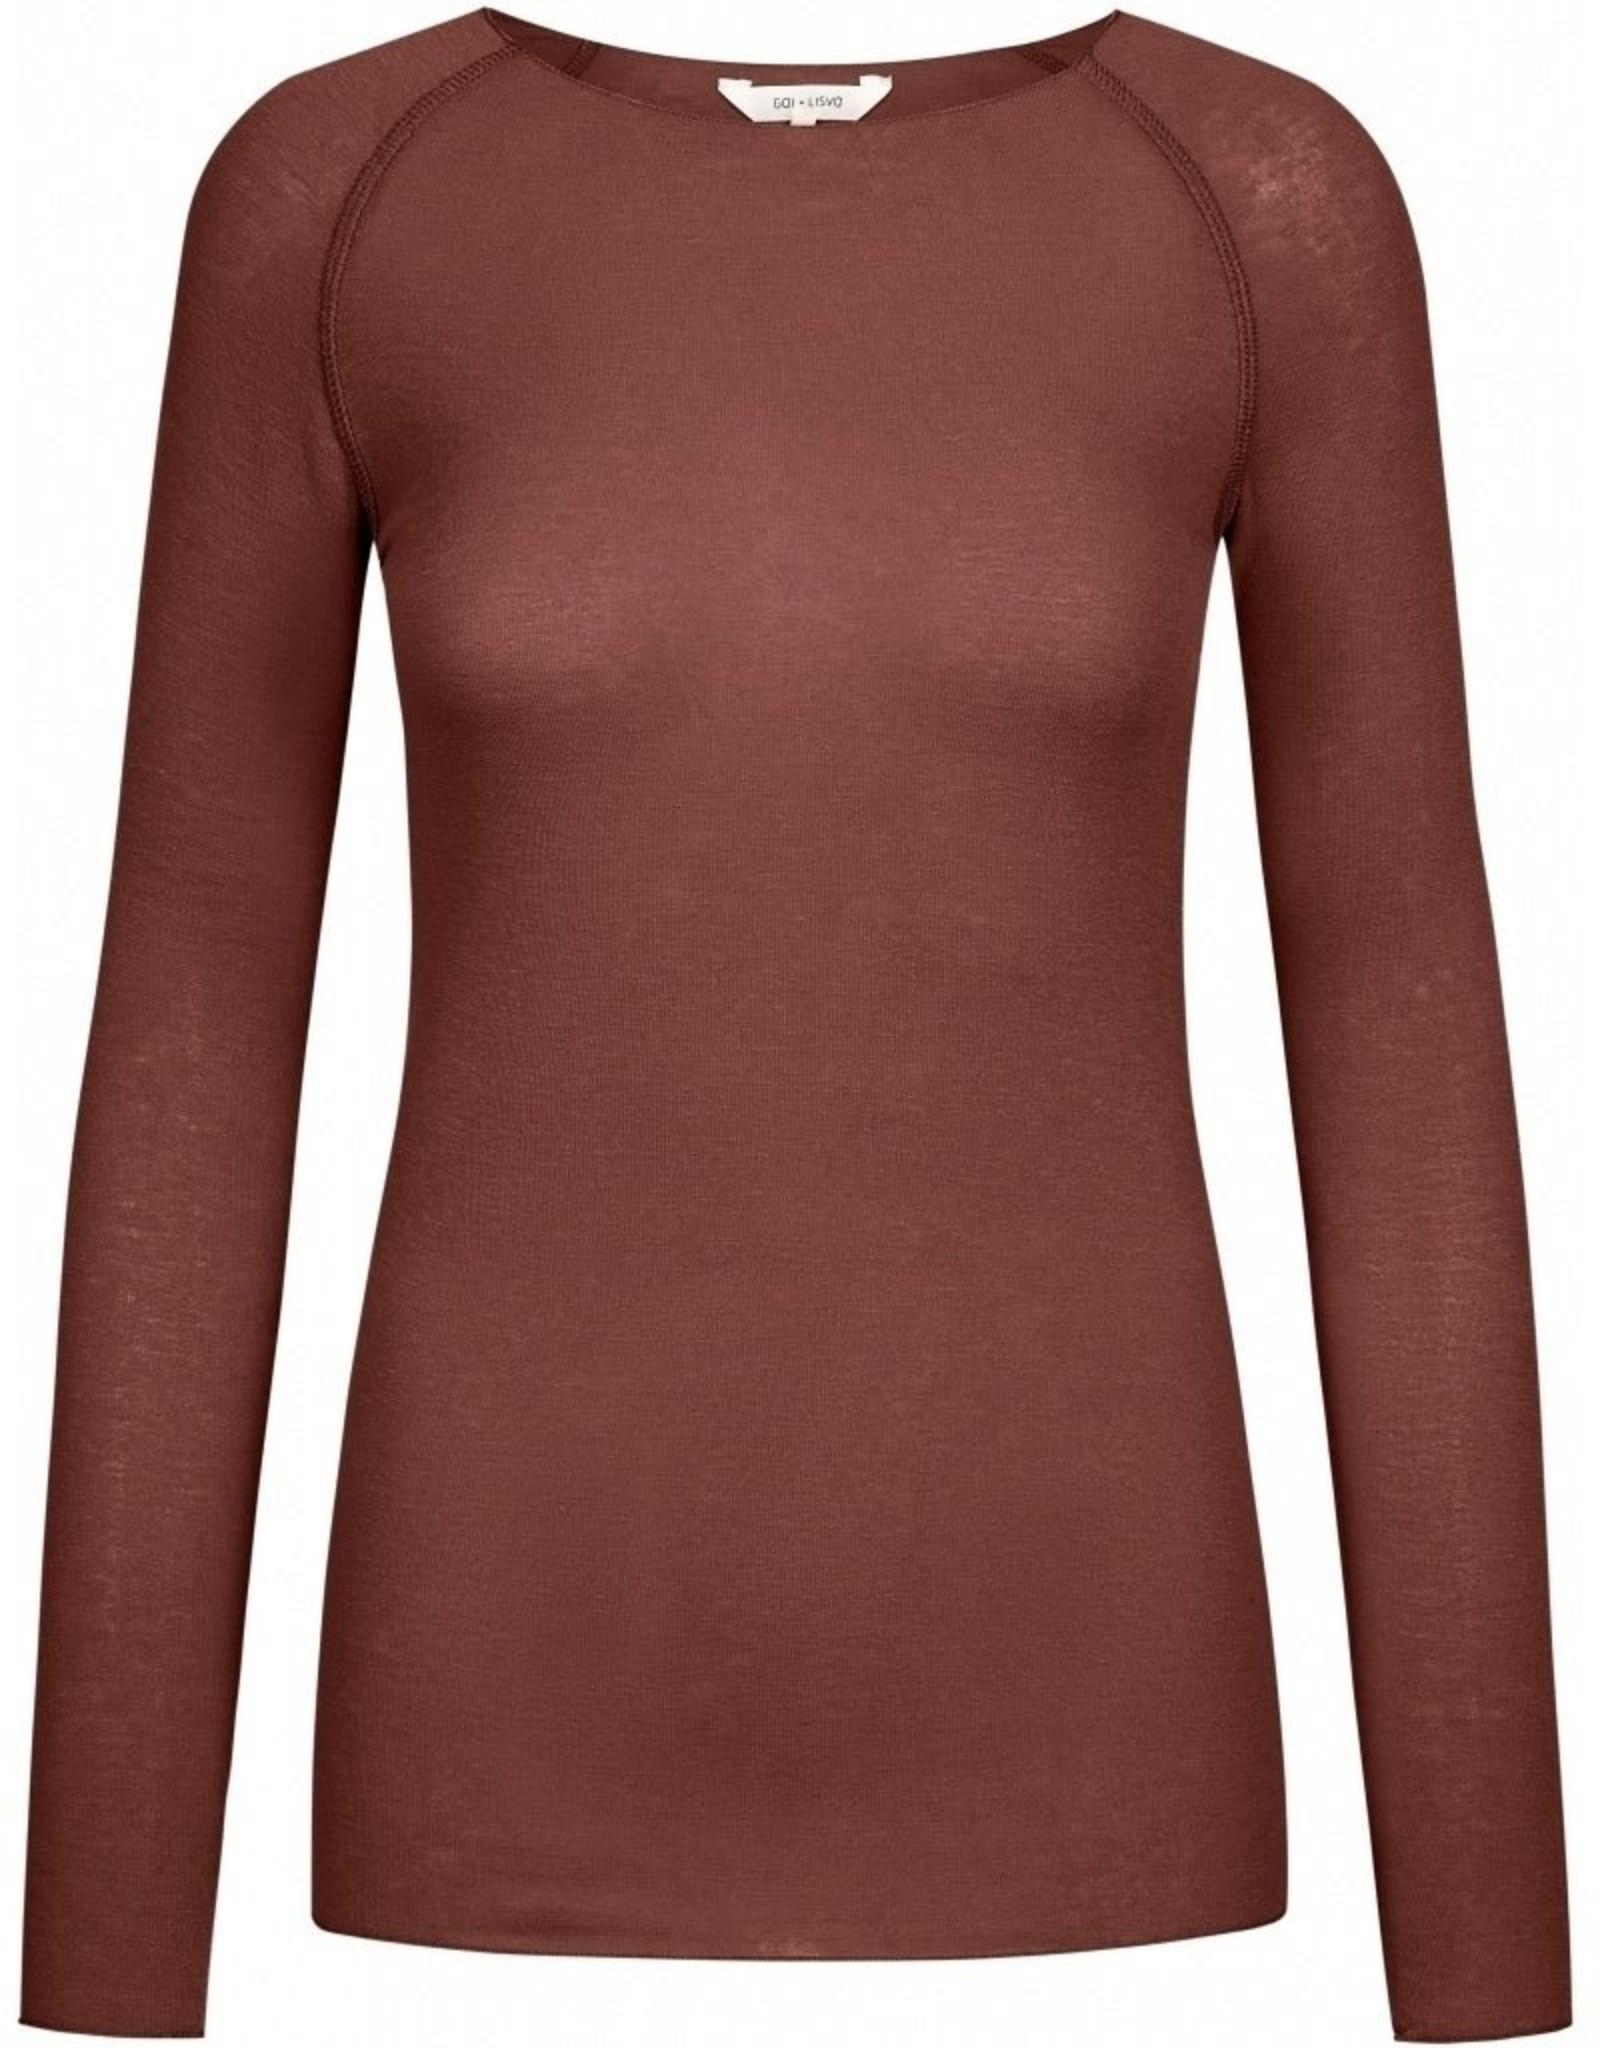 Gai&Lisva Amalie shirt wol/viscose Marron